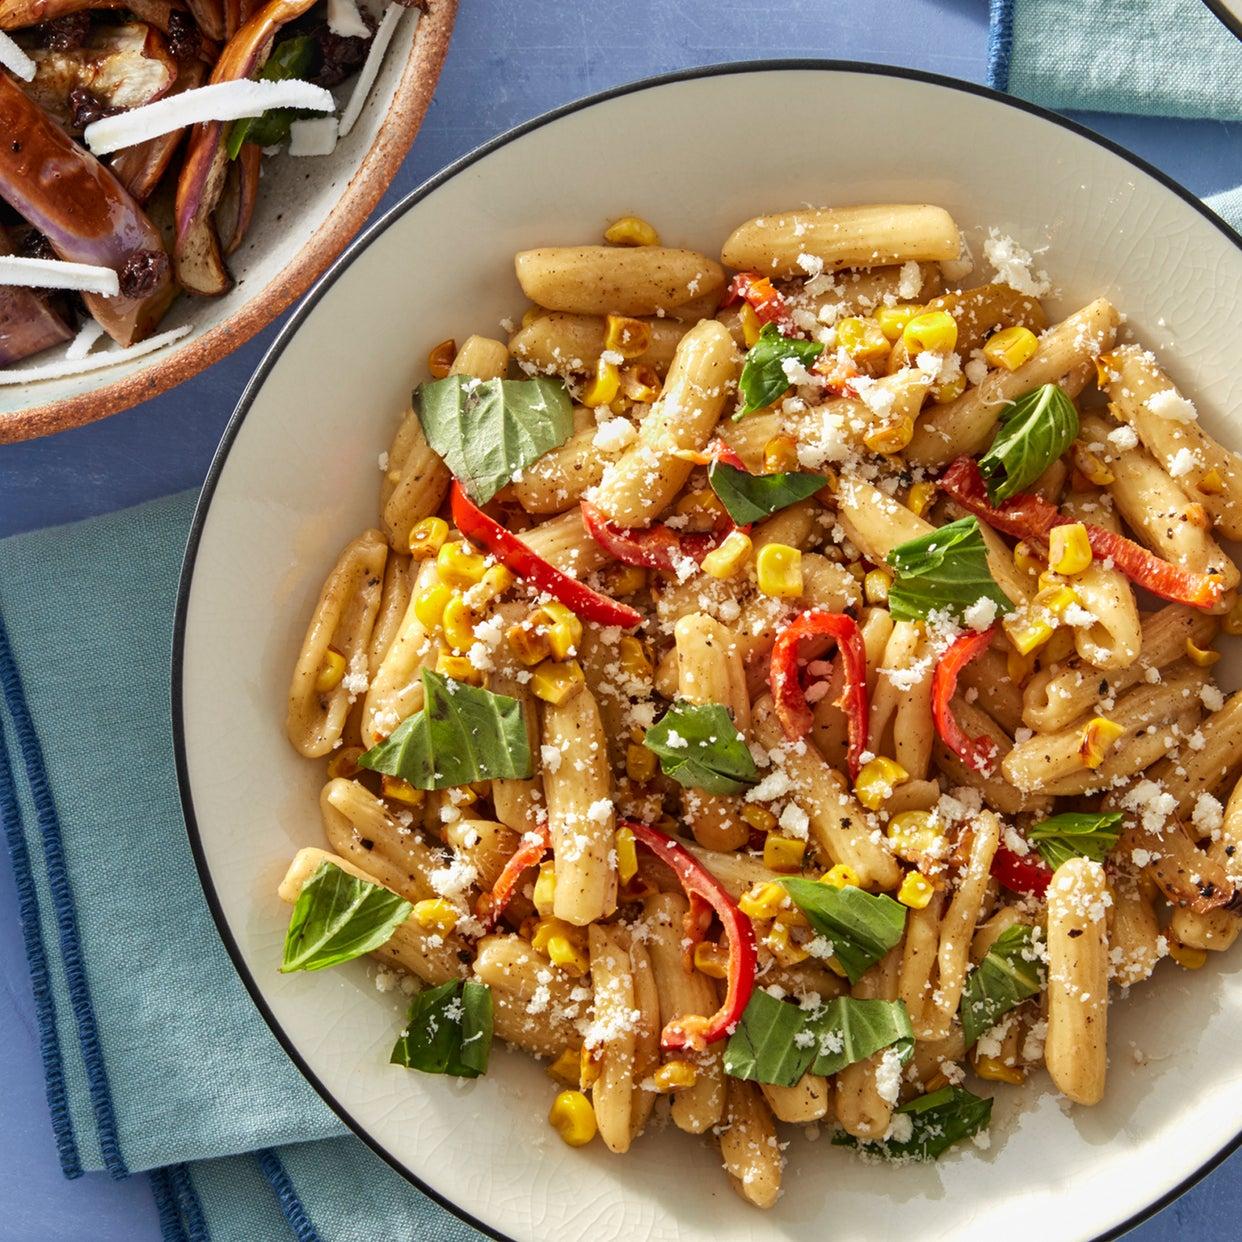 Fresh Cavatelli & Spicy Corn with Fairy Tale Eggplants, Currants, & Ricotta Salata